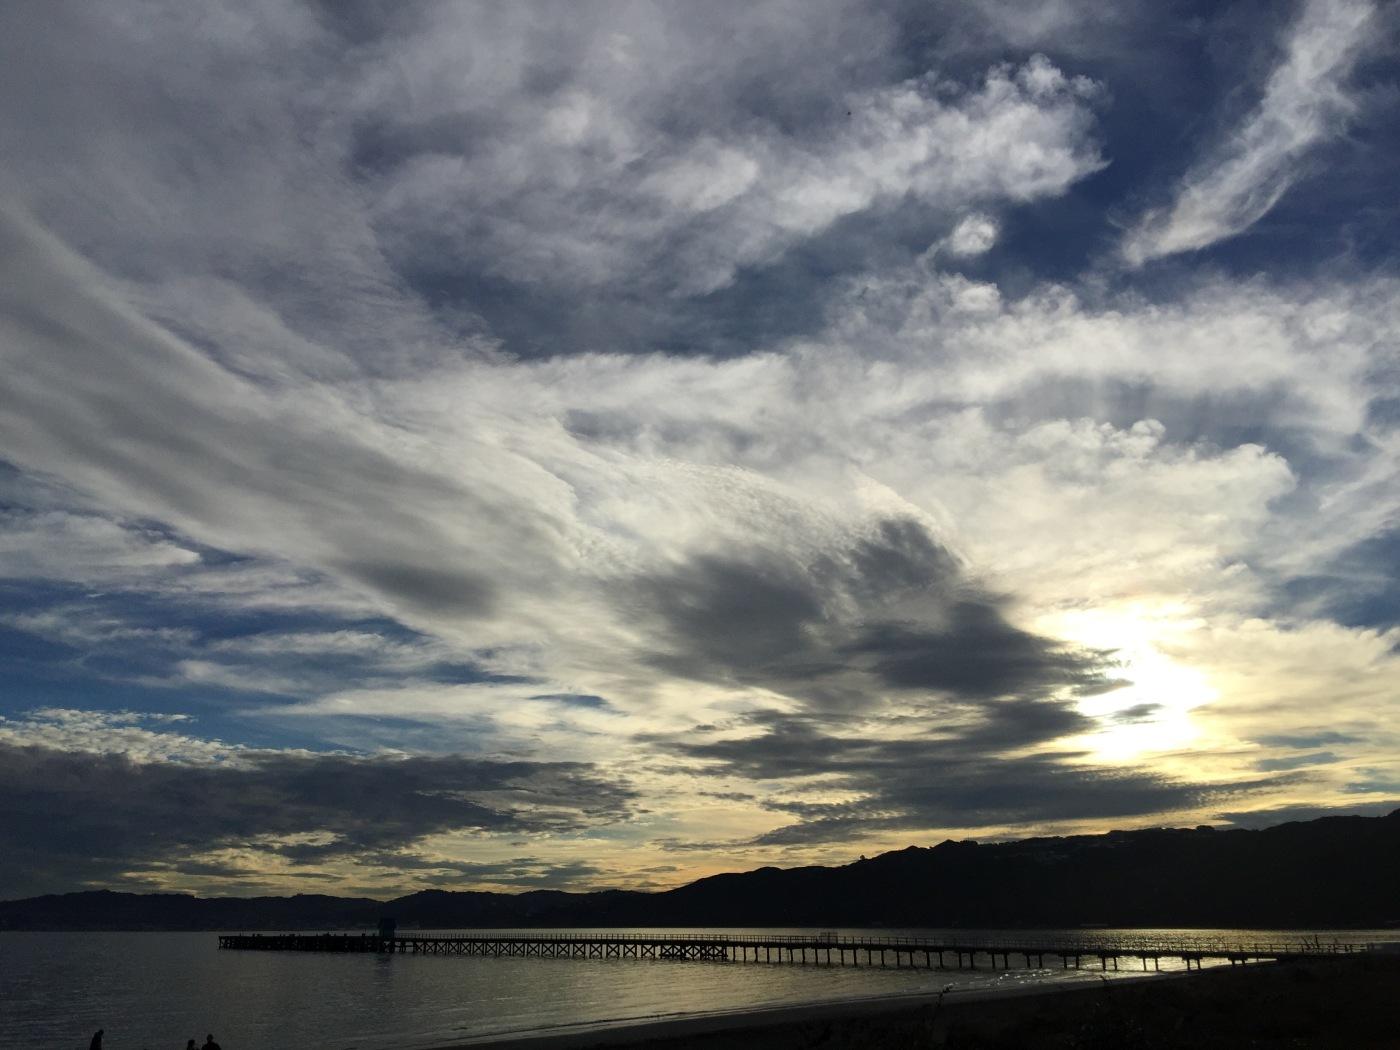 Sunset, Petone, New Zealand